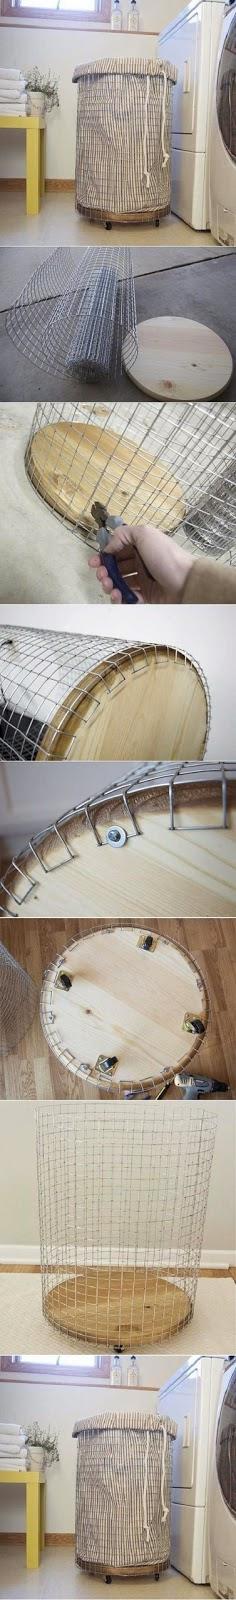 DIY Laundry basket